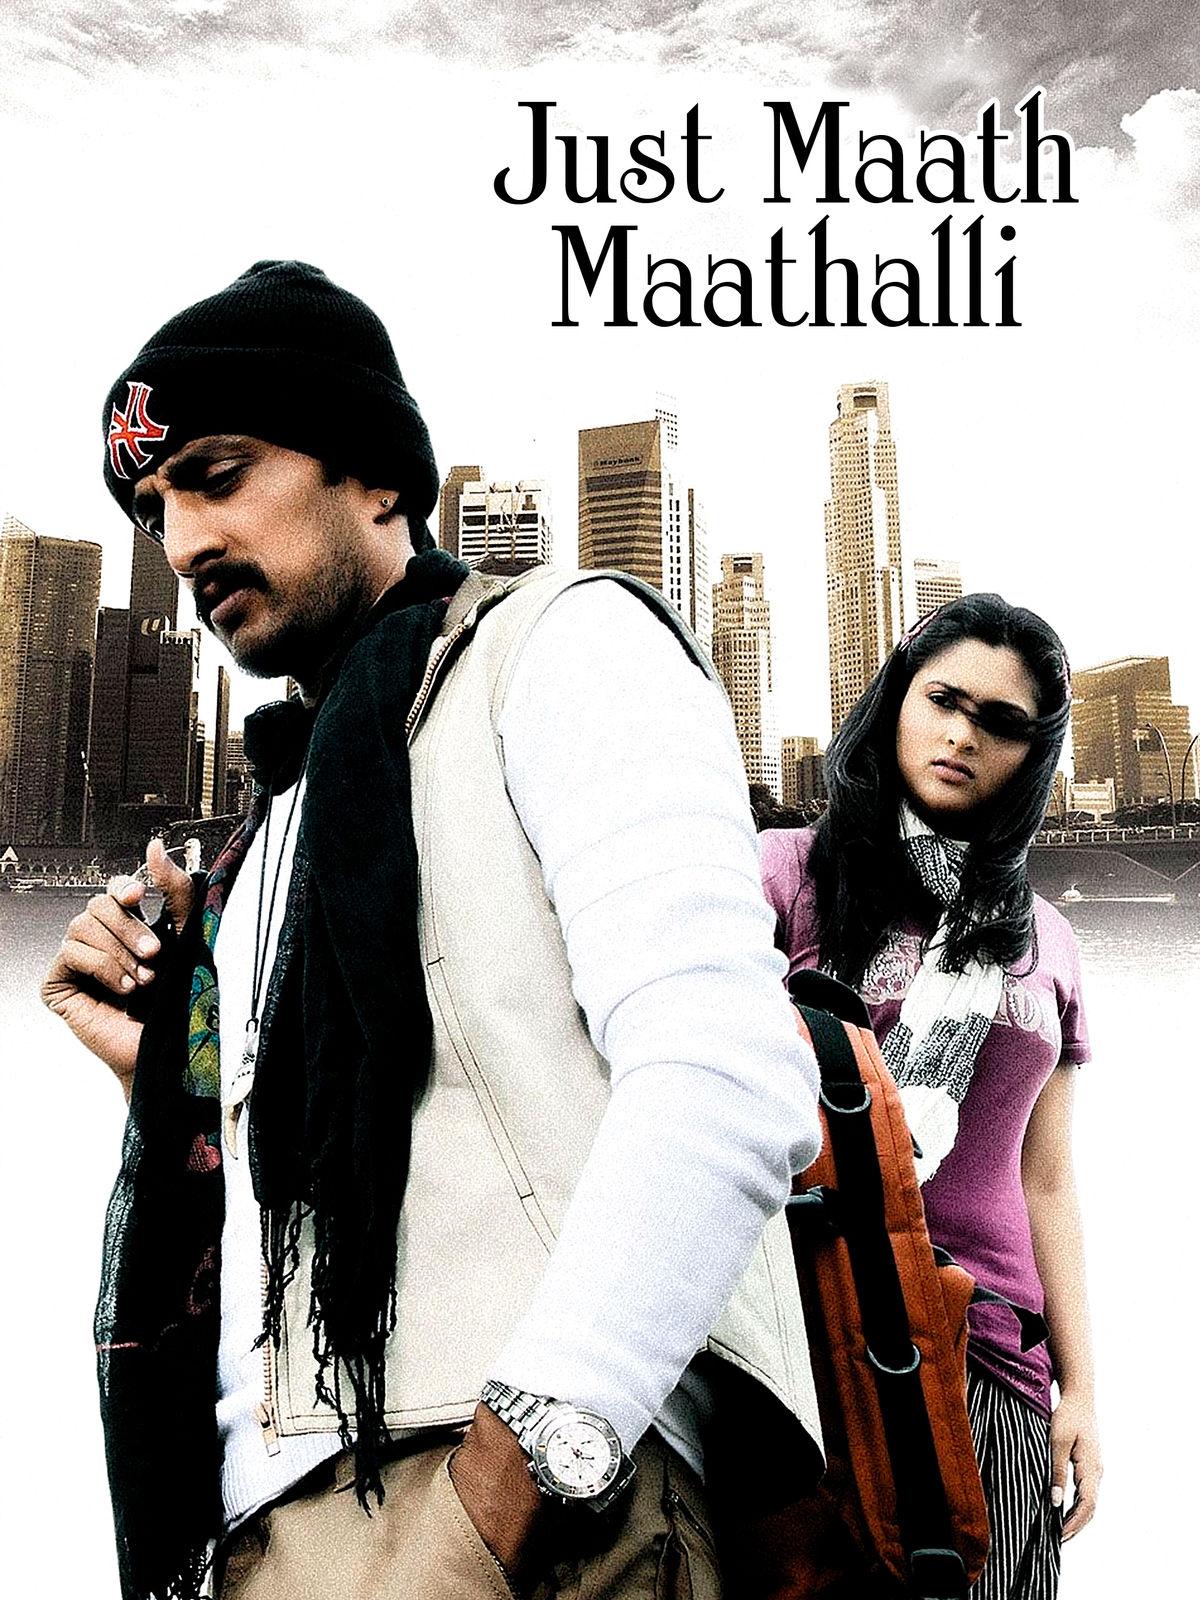 Just Maath Maathalli